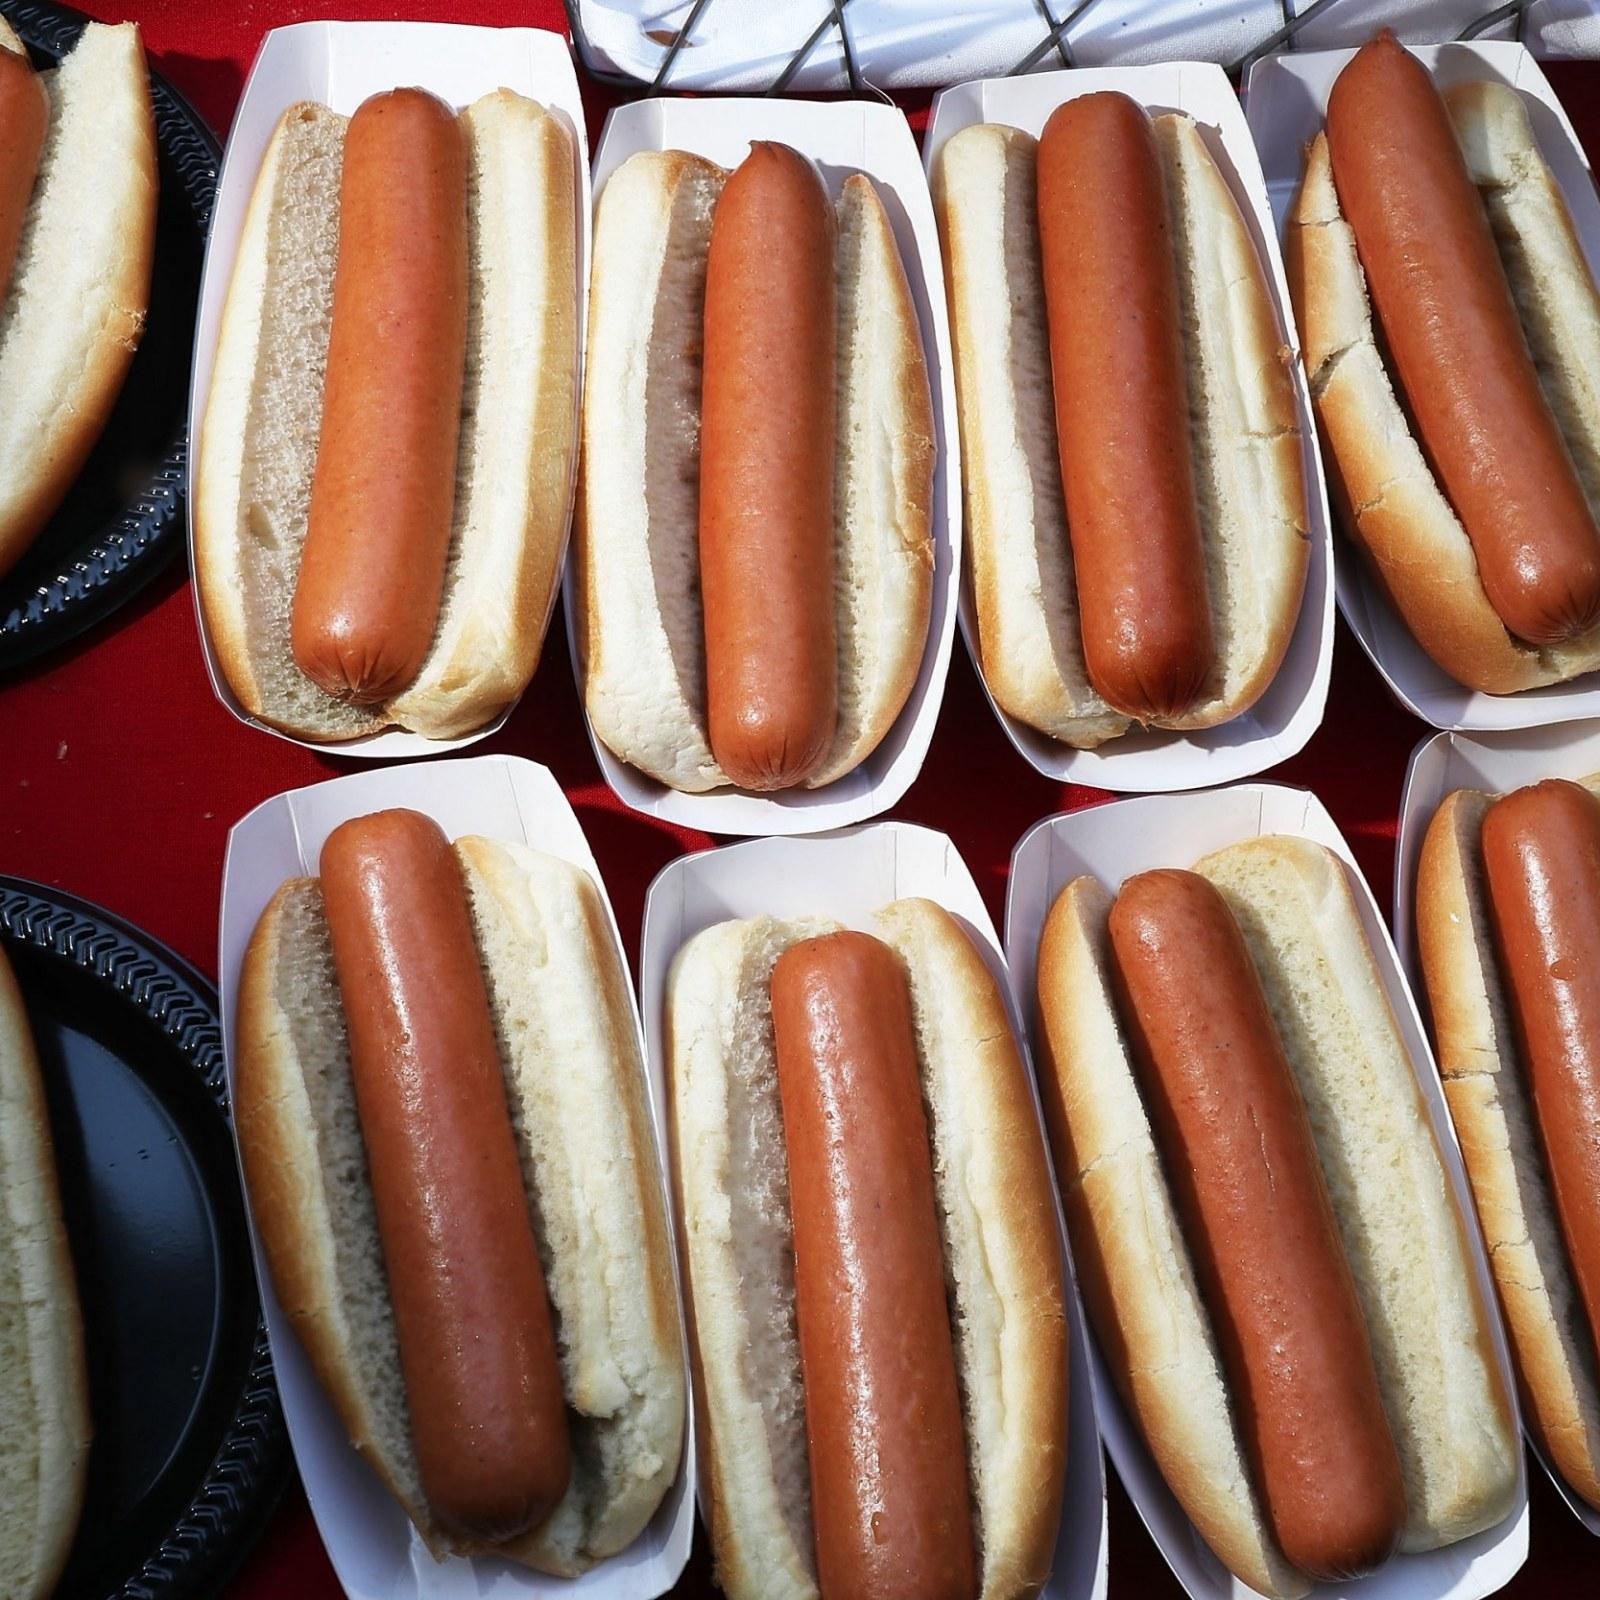 National Hot Dog Day 2018 Deals 7 Eleven Dog Haus